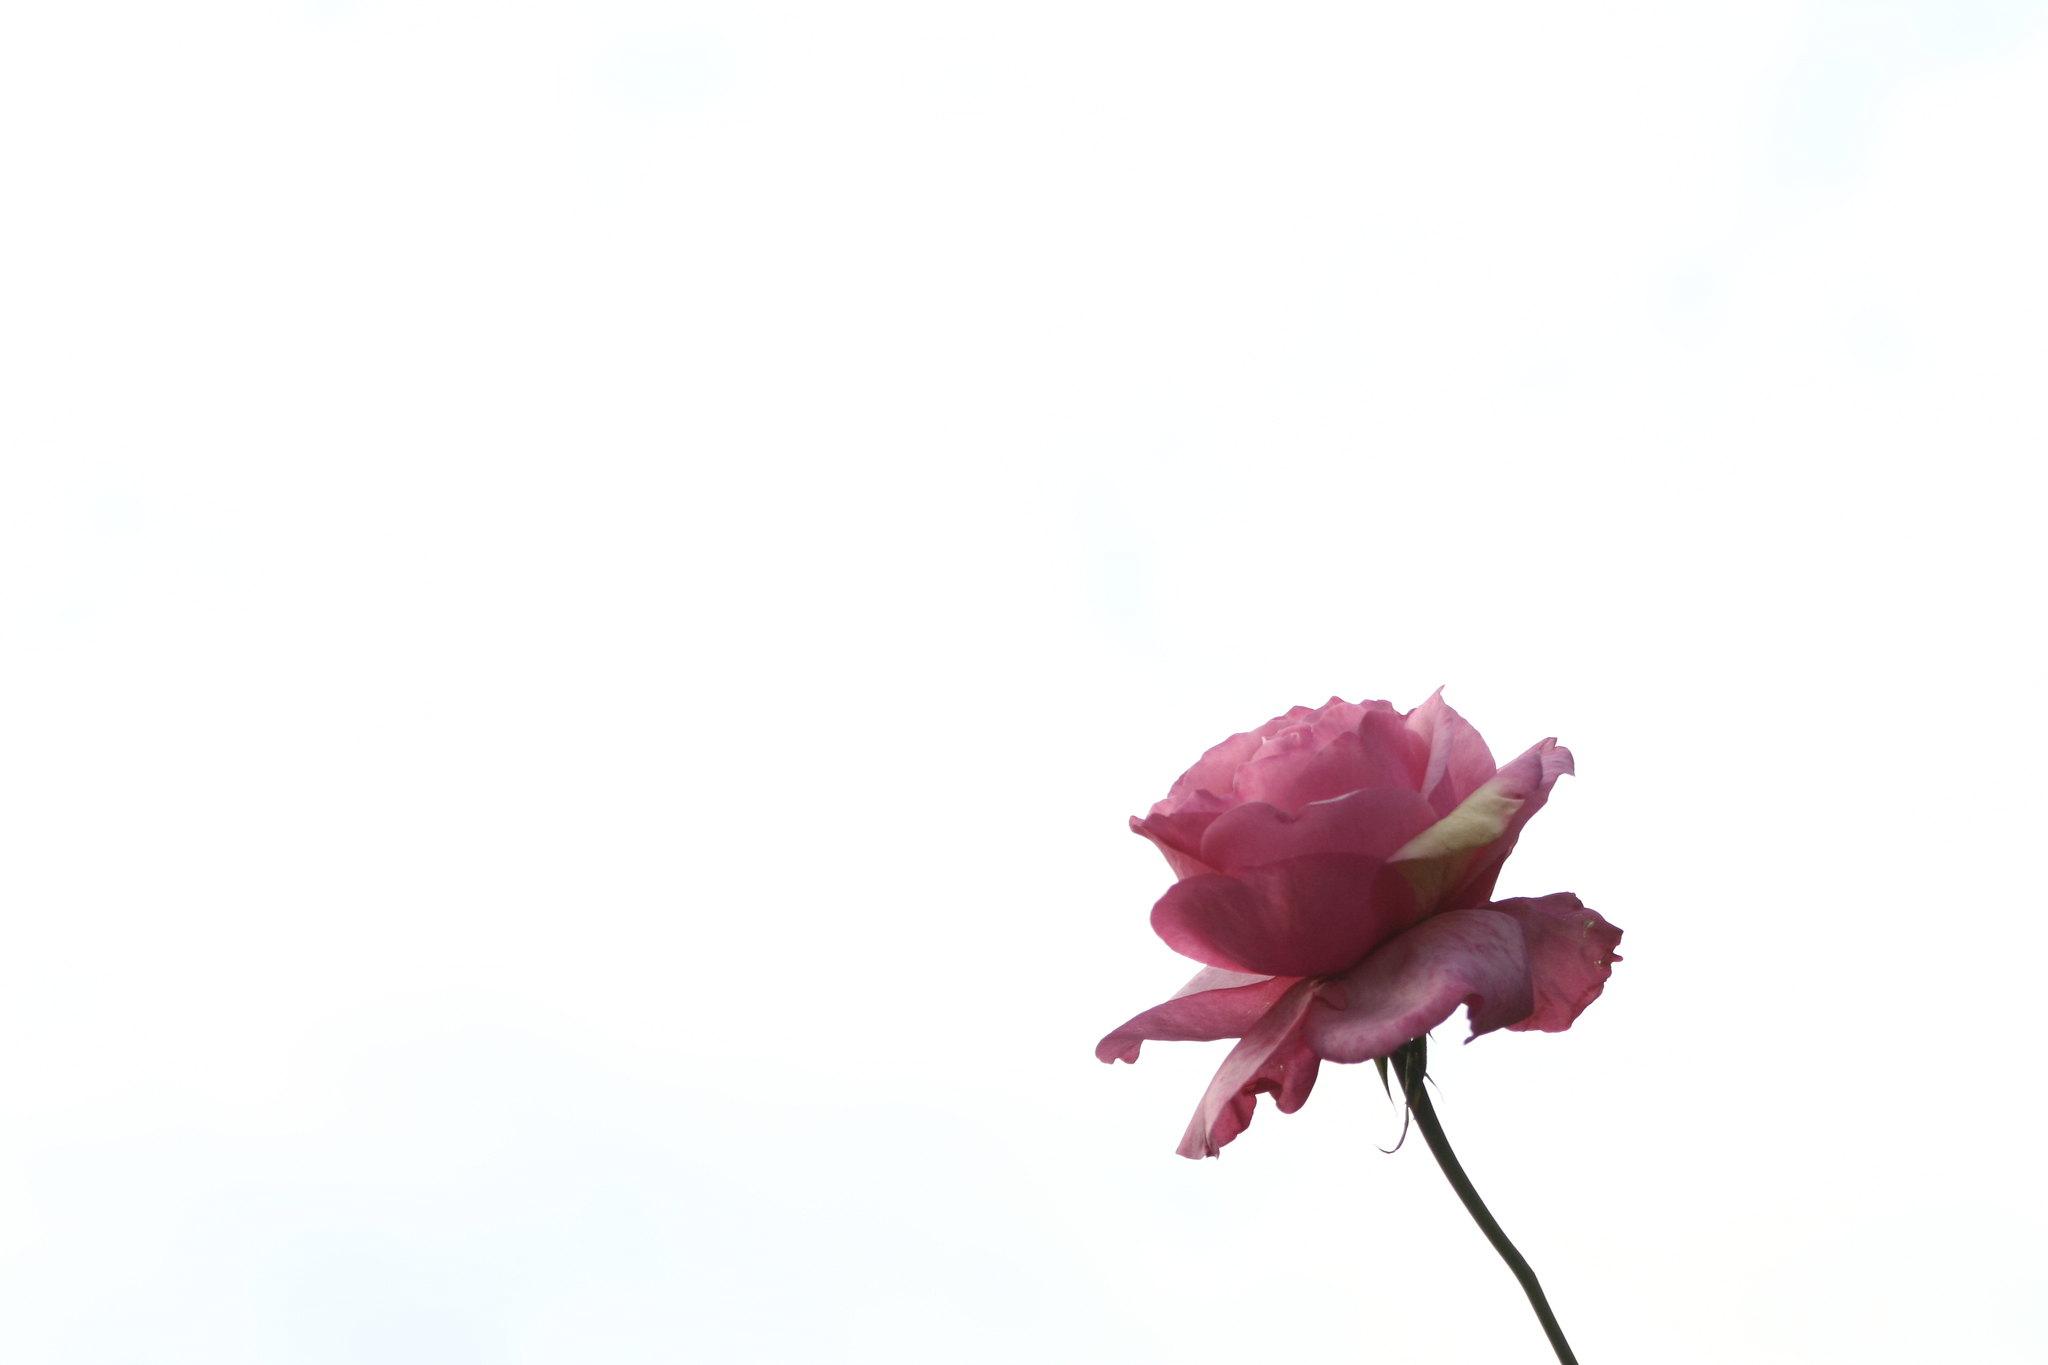 Pink rose, January sky